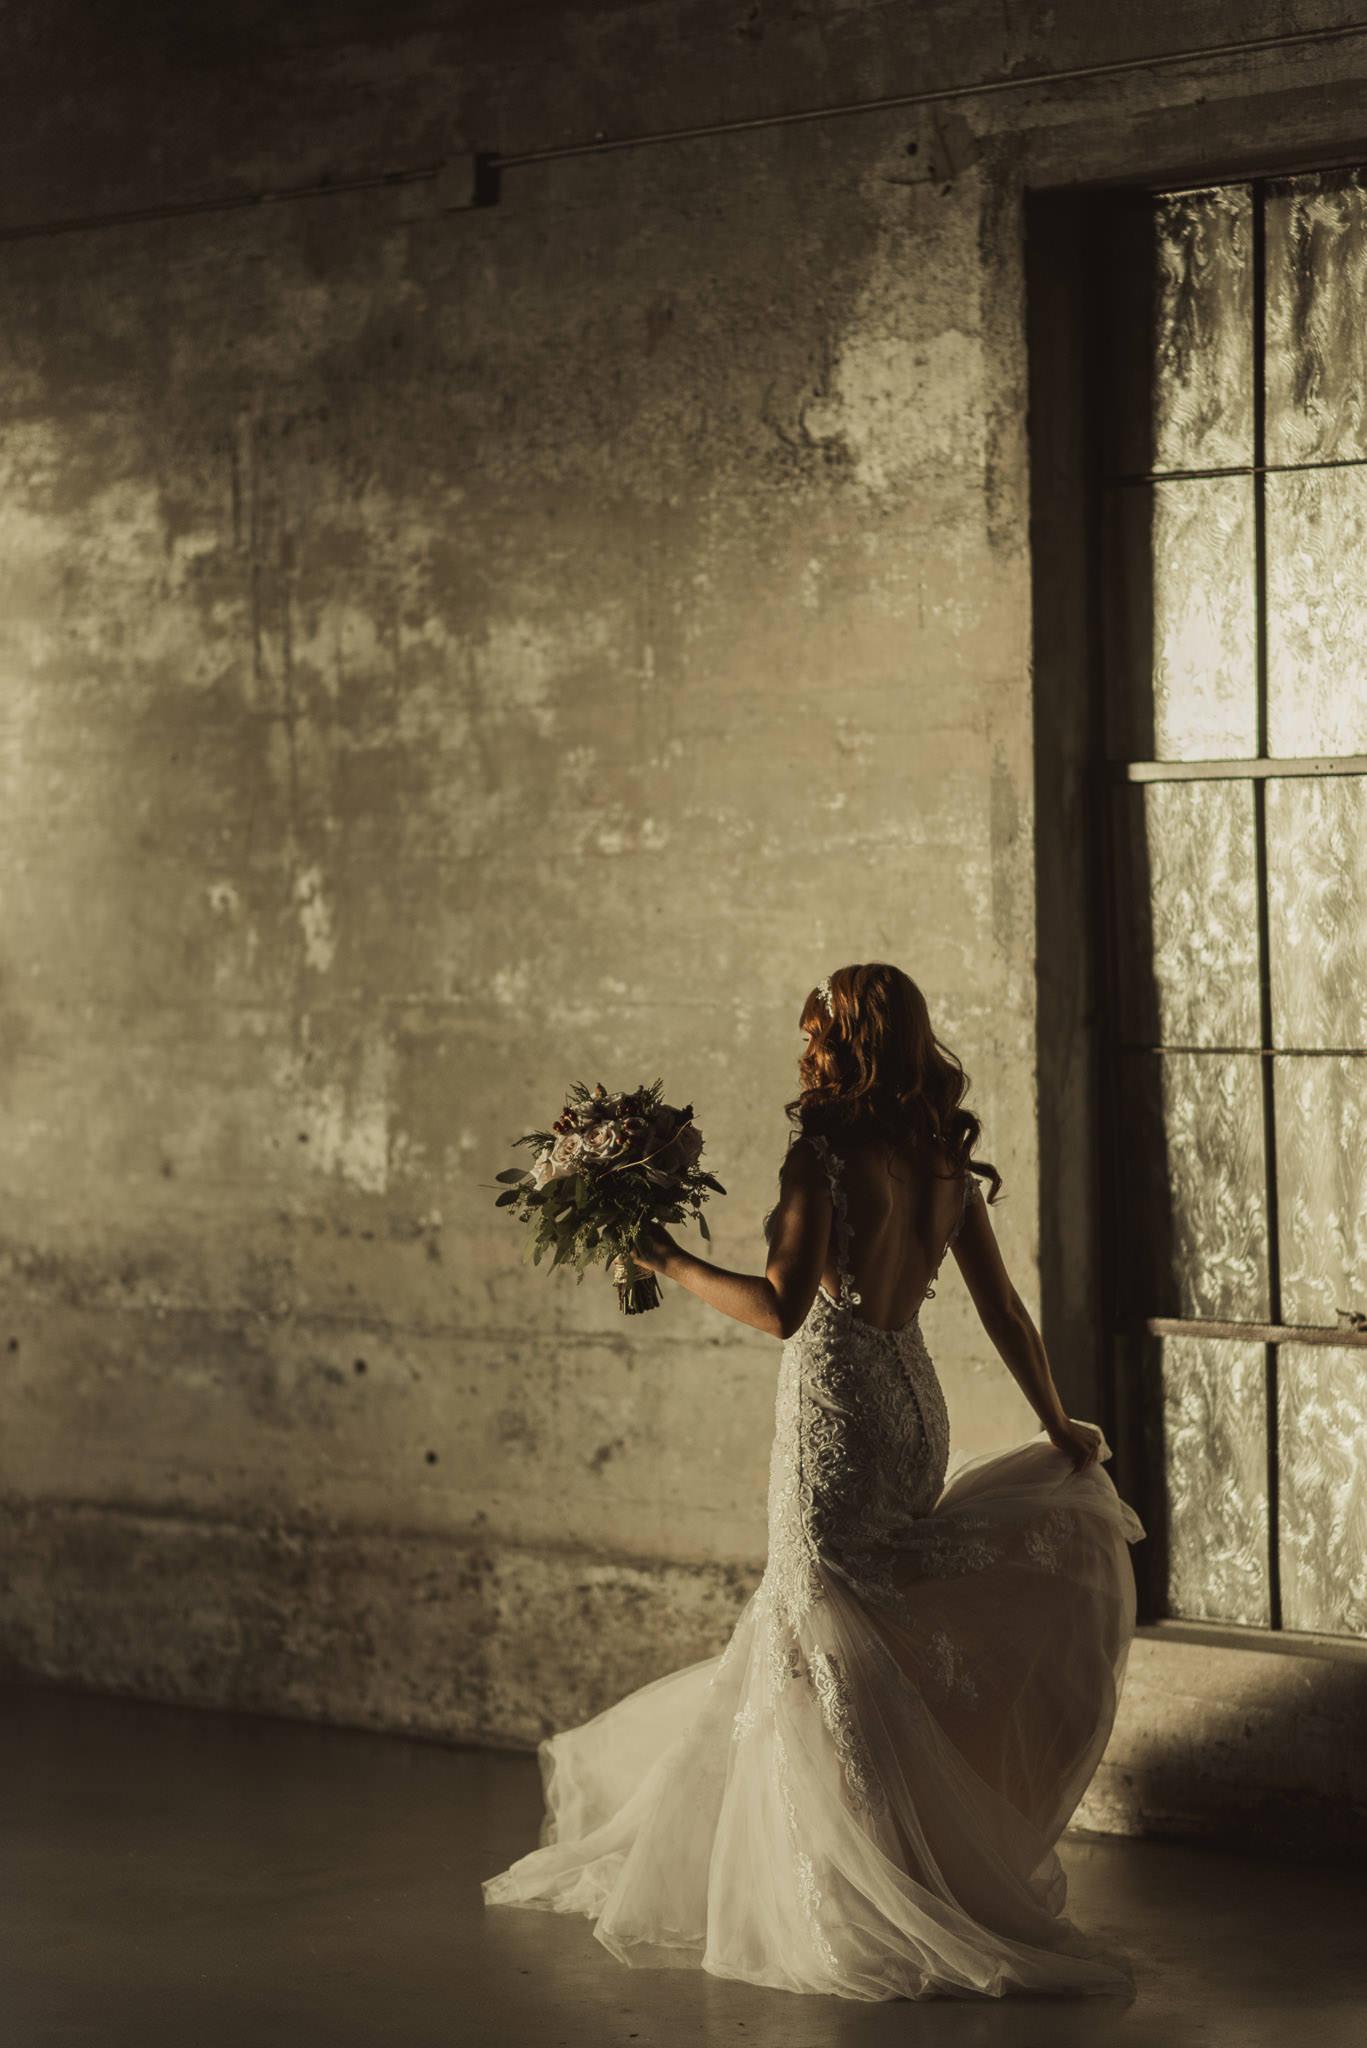 Cynthia-Curtis-Olde-Dobbine-Station-Houston-Wedding-Photographer-sm-66.jpg